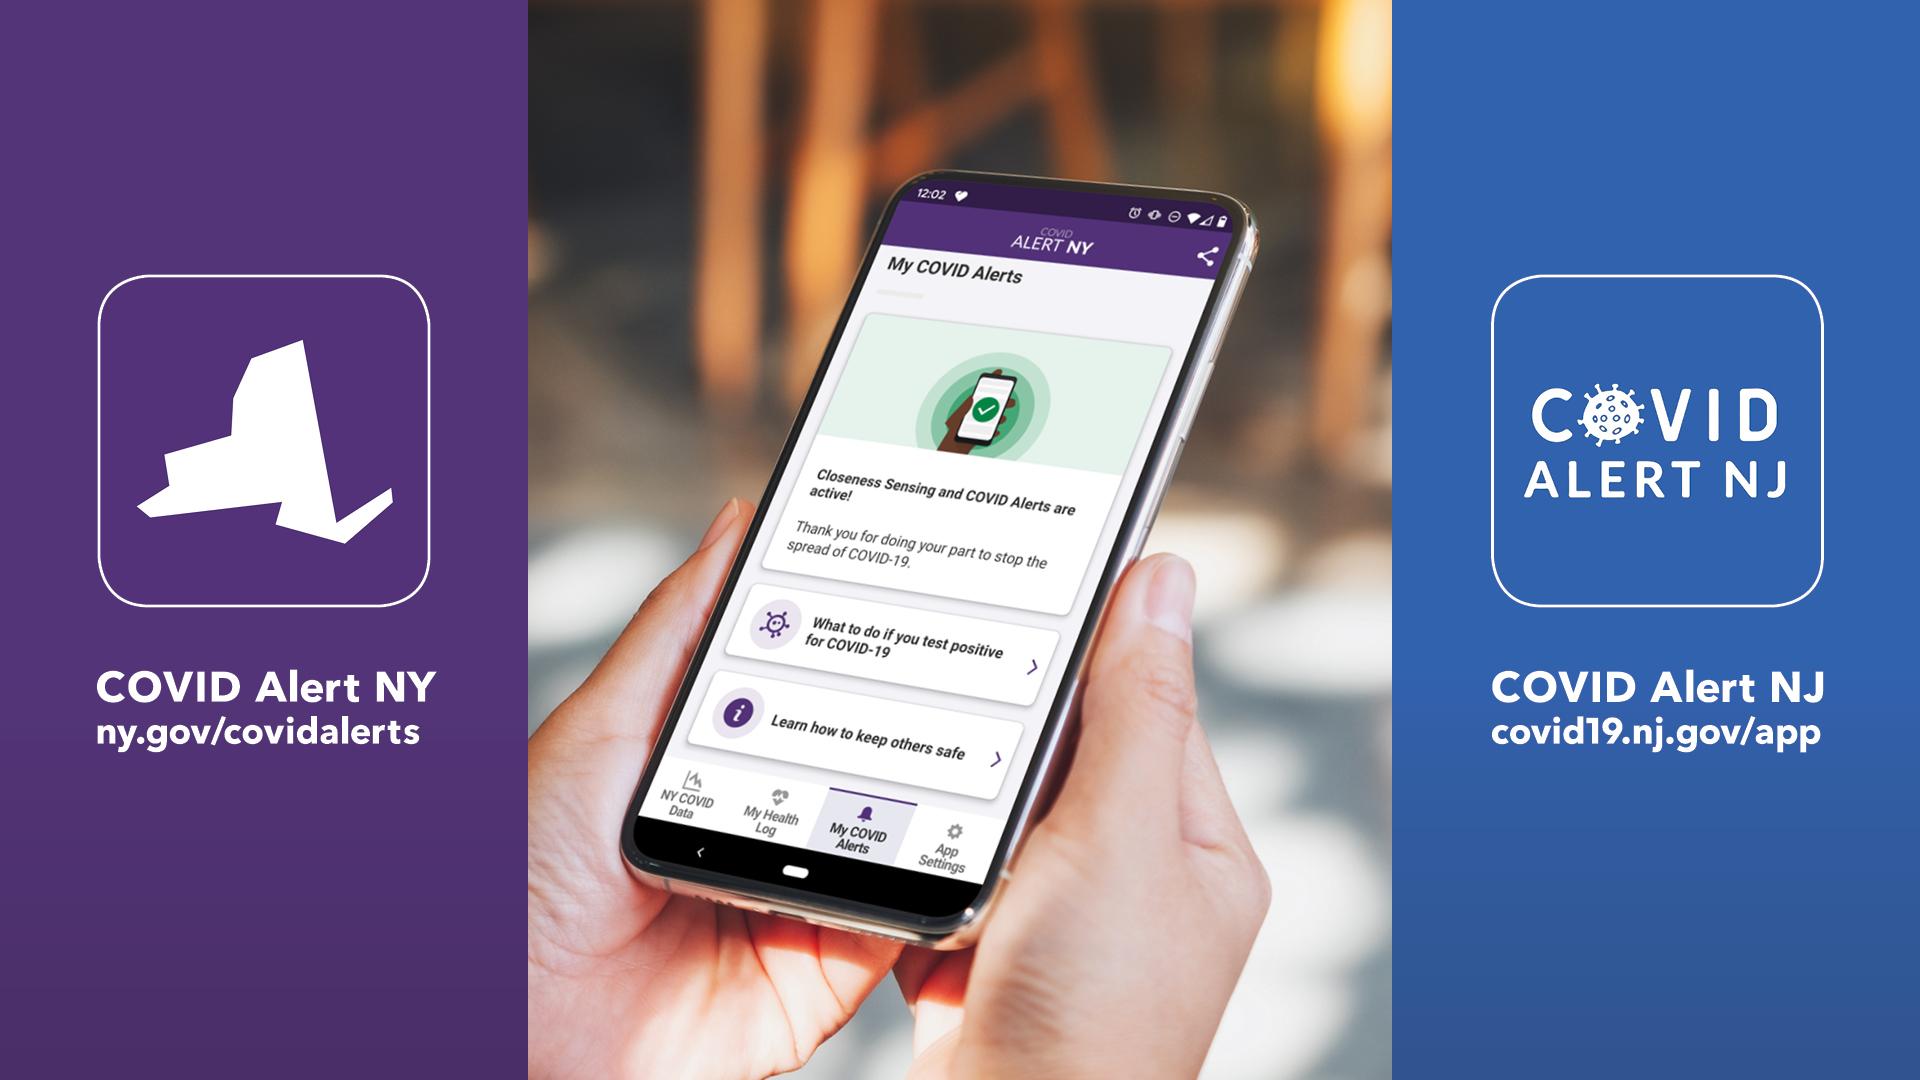 Covid alert app image